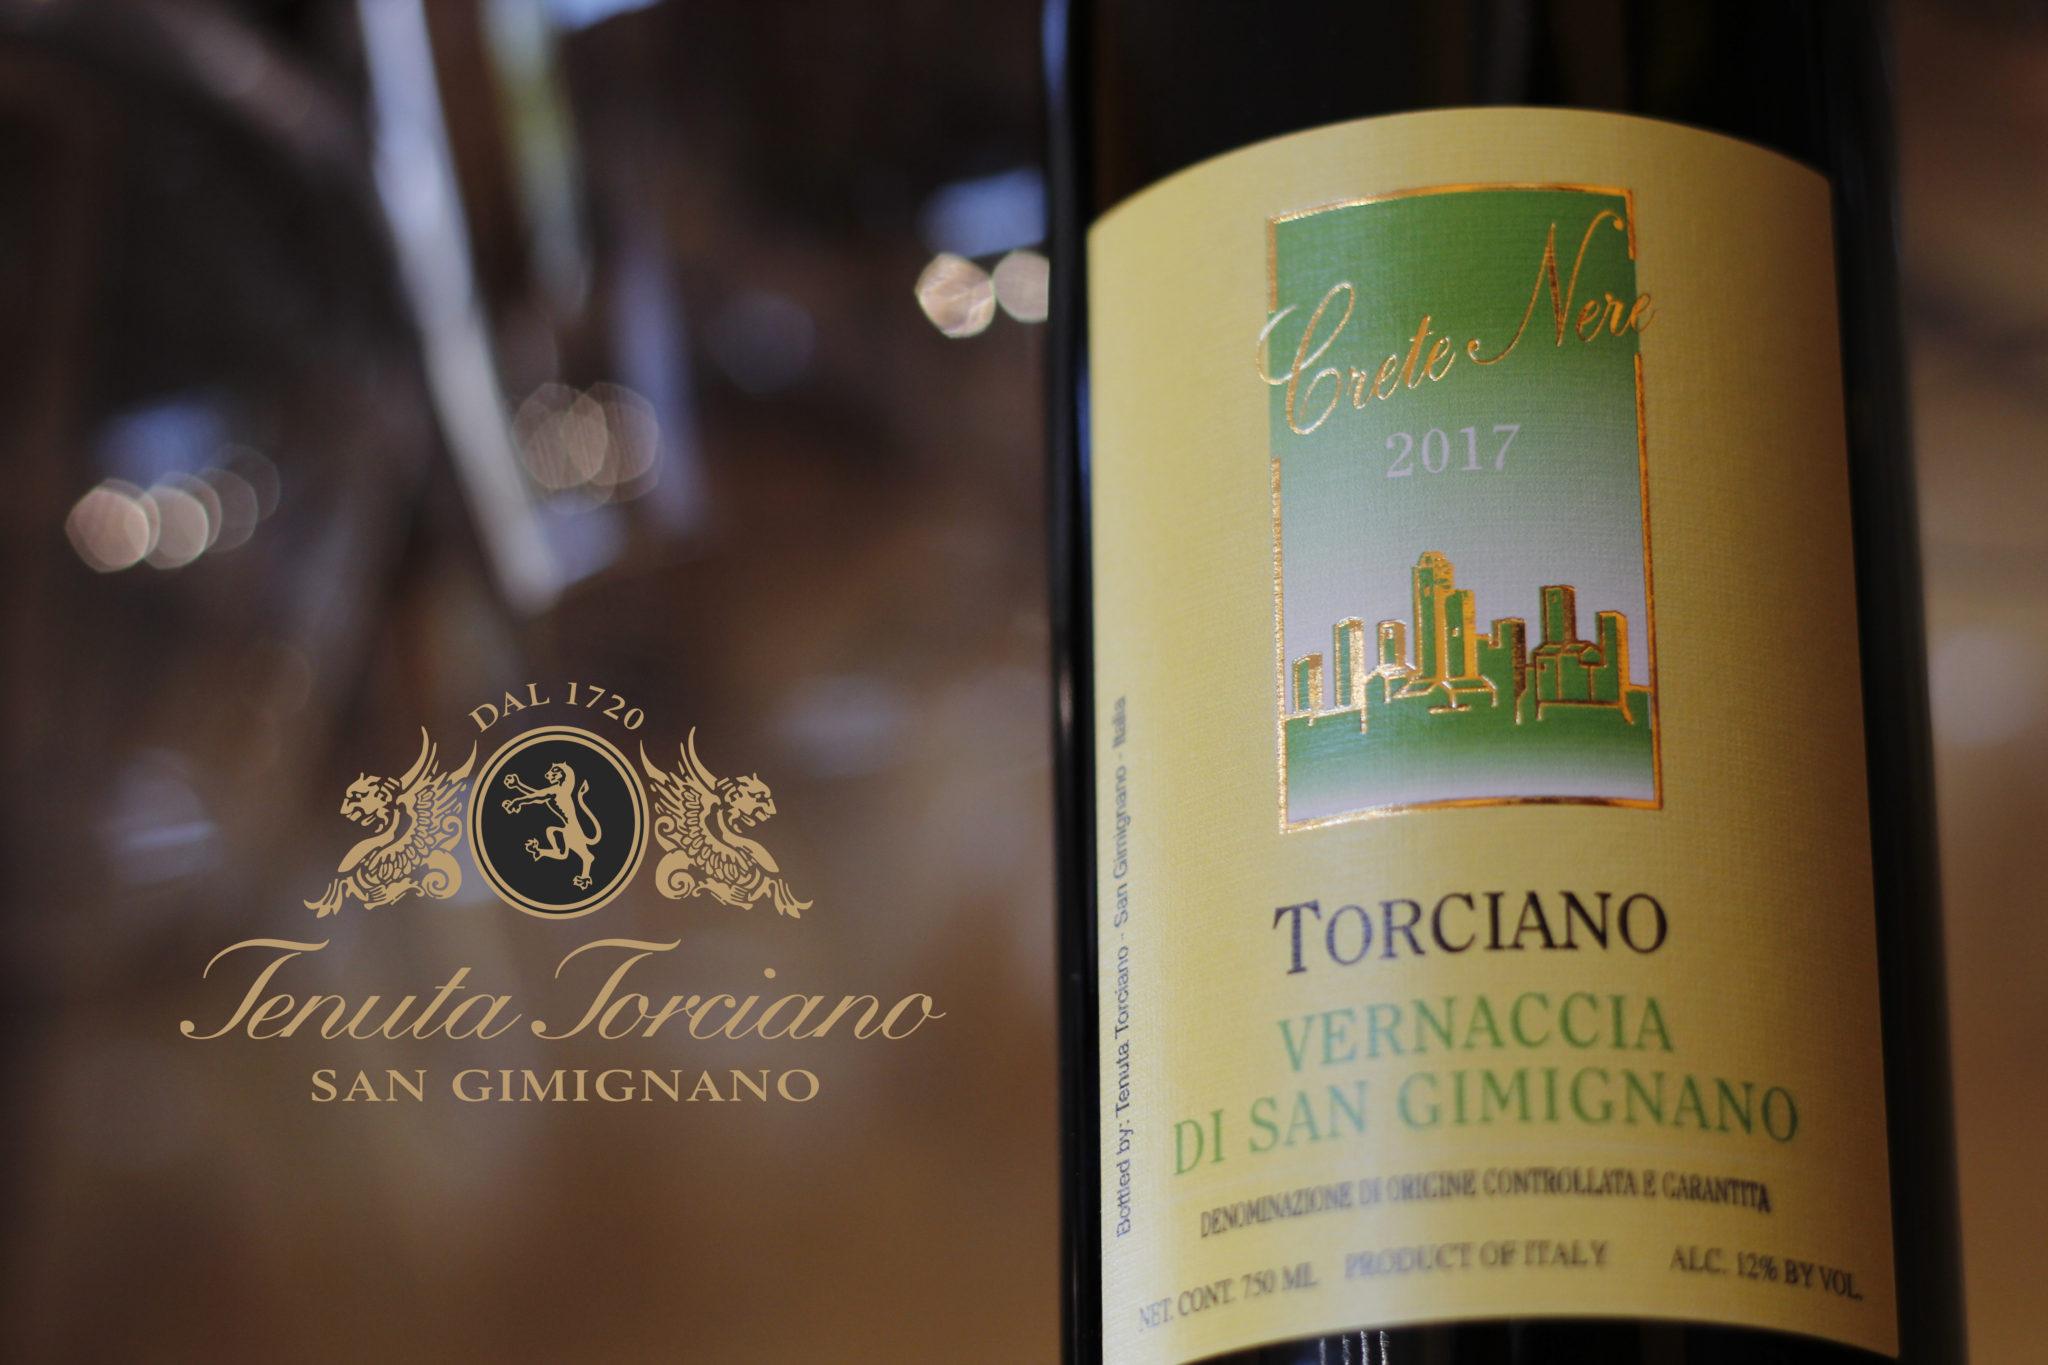 Ready for the new Vernaccia San Gimignano by Tenuta Torciano?